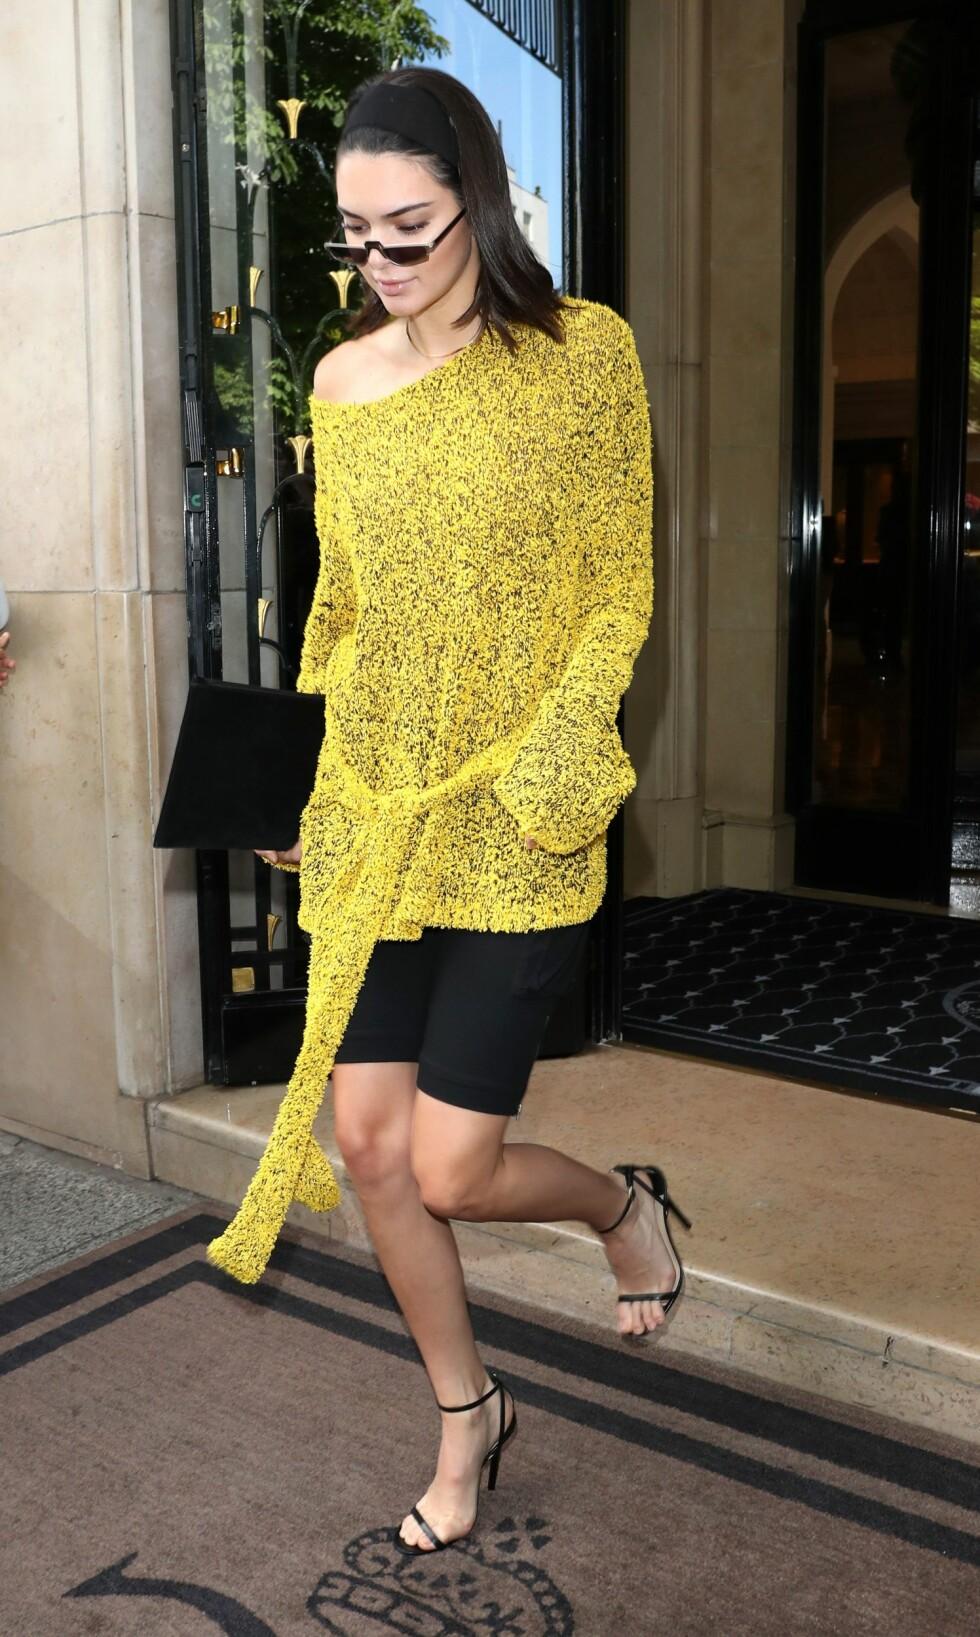 Kendall Jenner Foto: Shutterstock